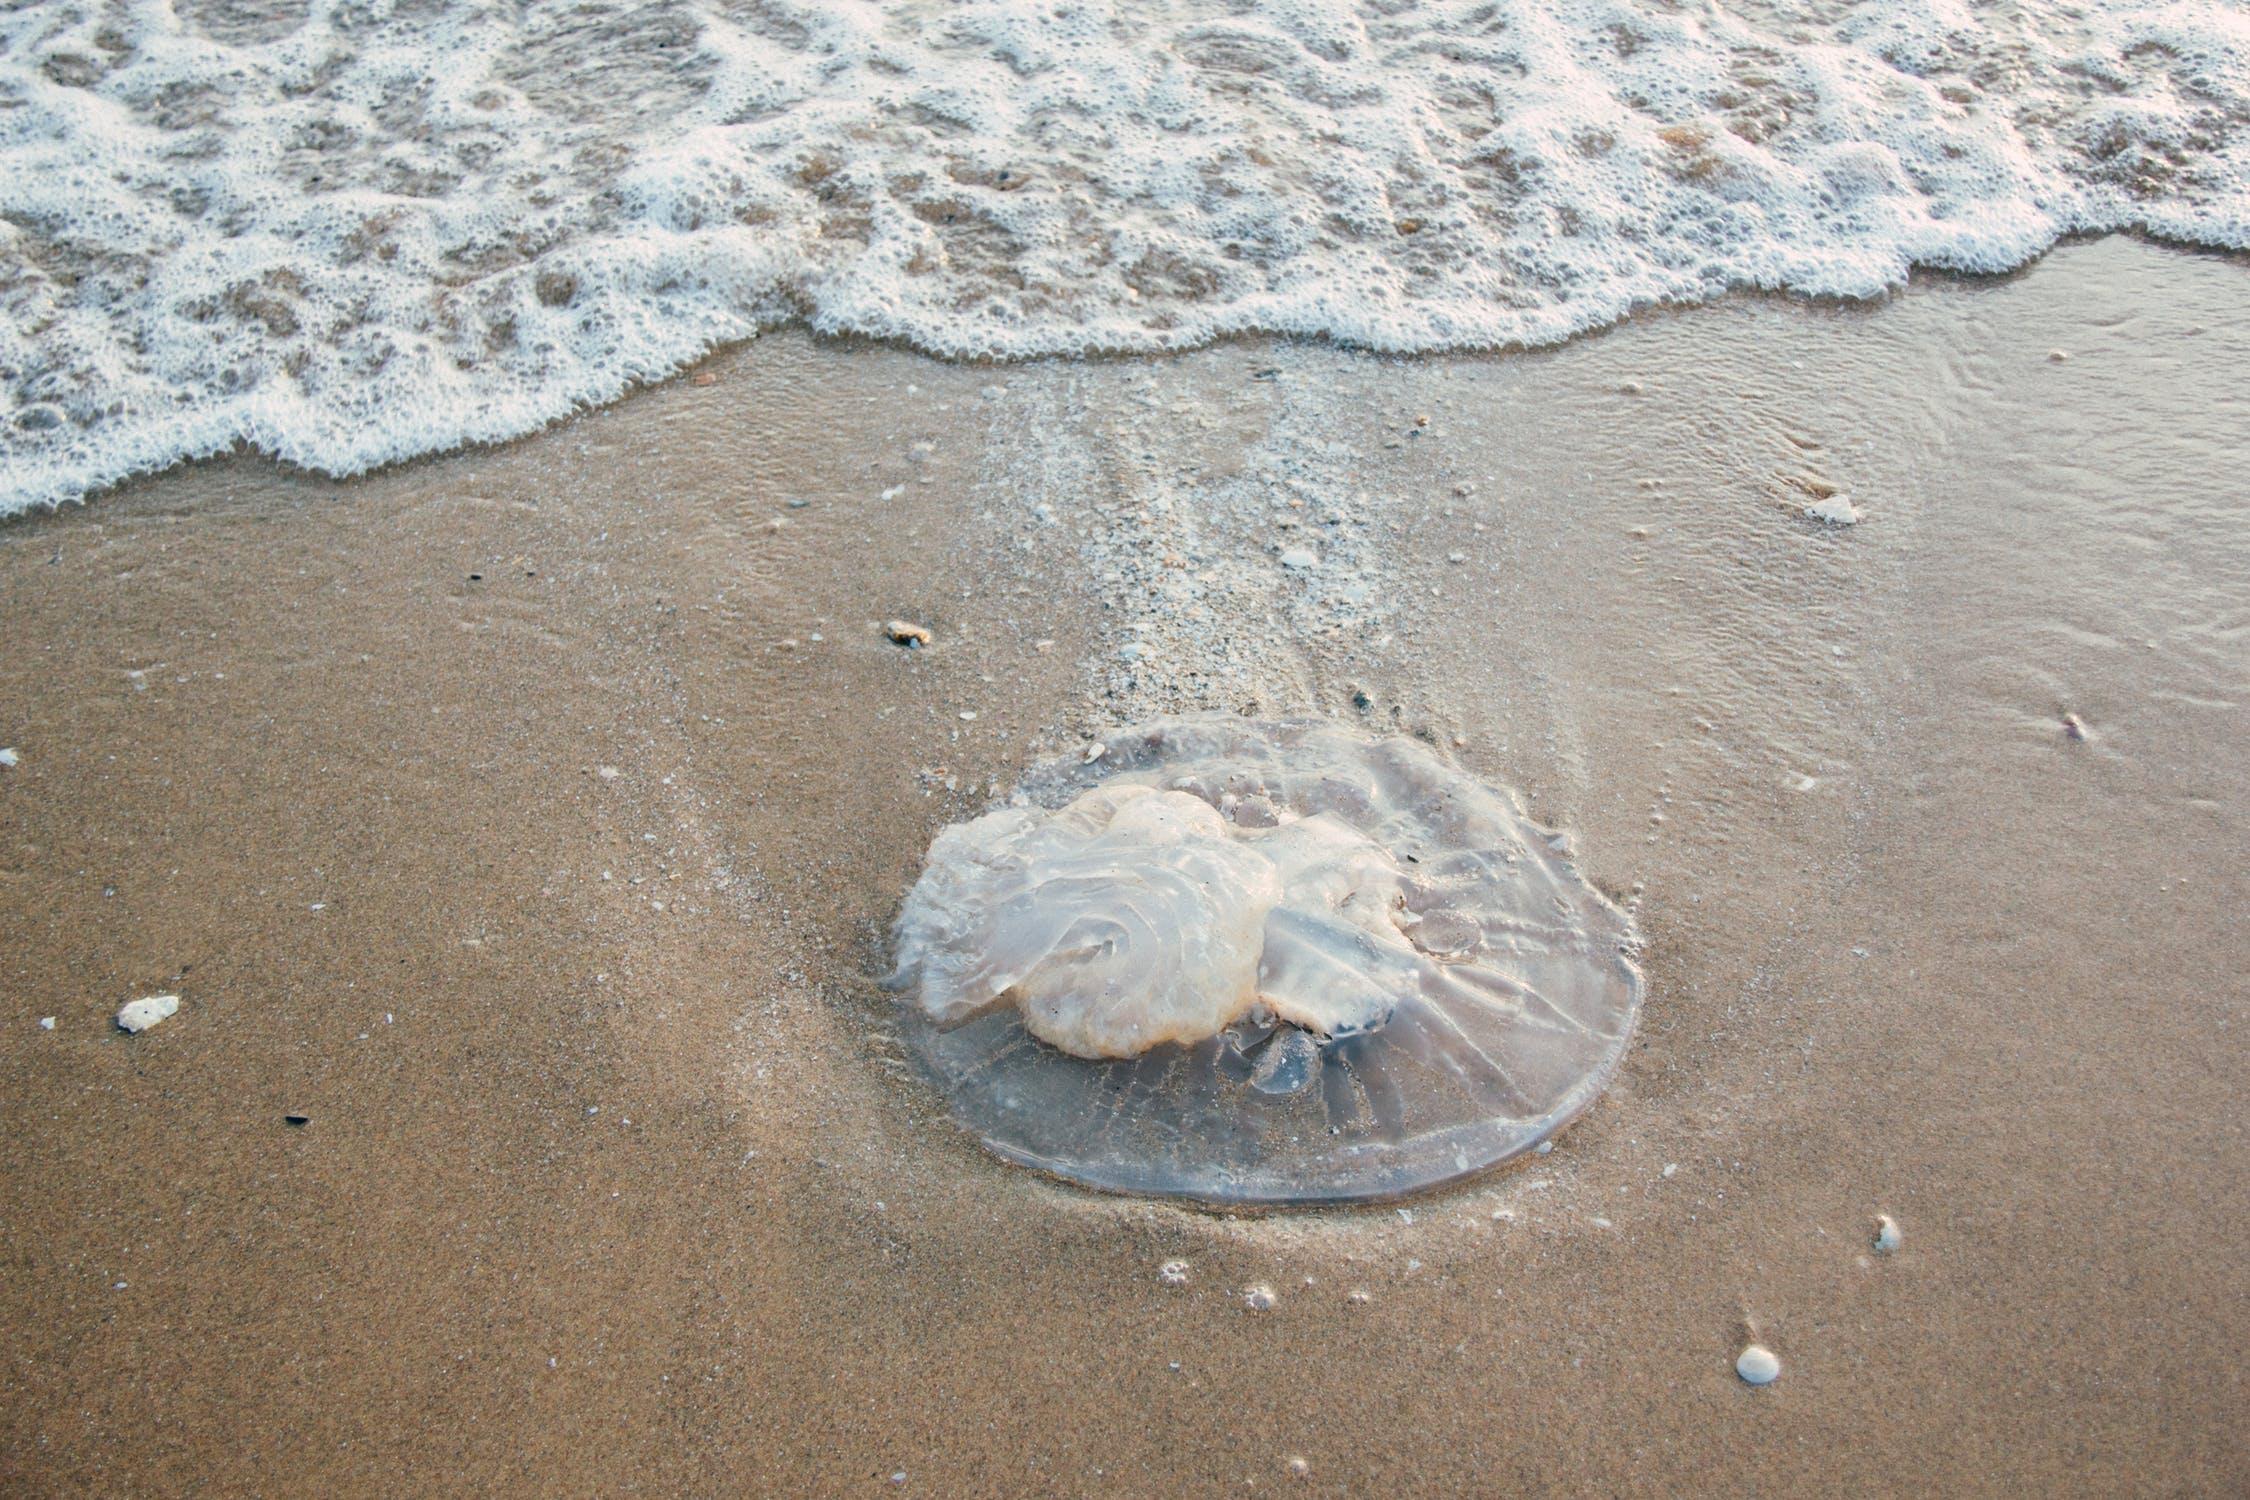 what-to-do-jellyfish-sting.jpeg